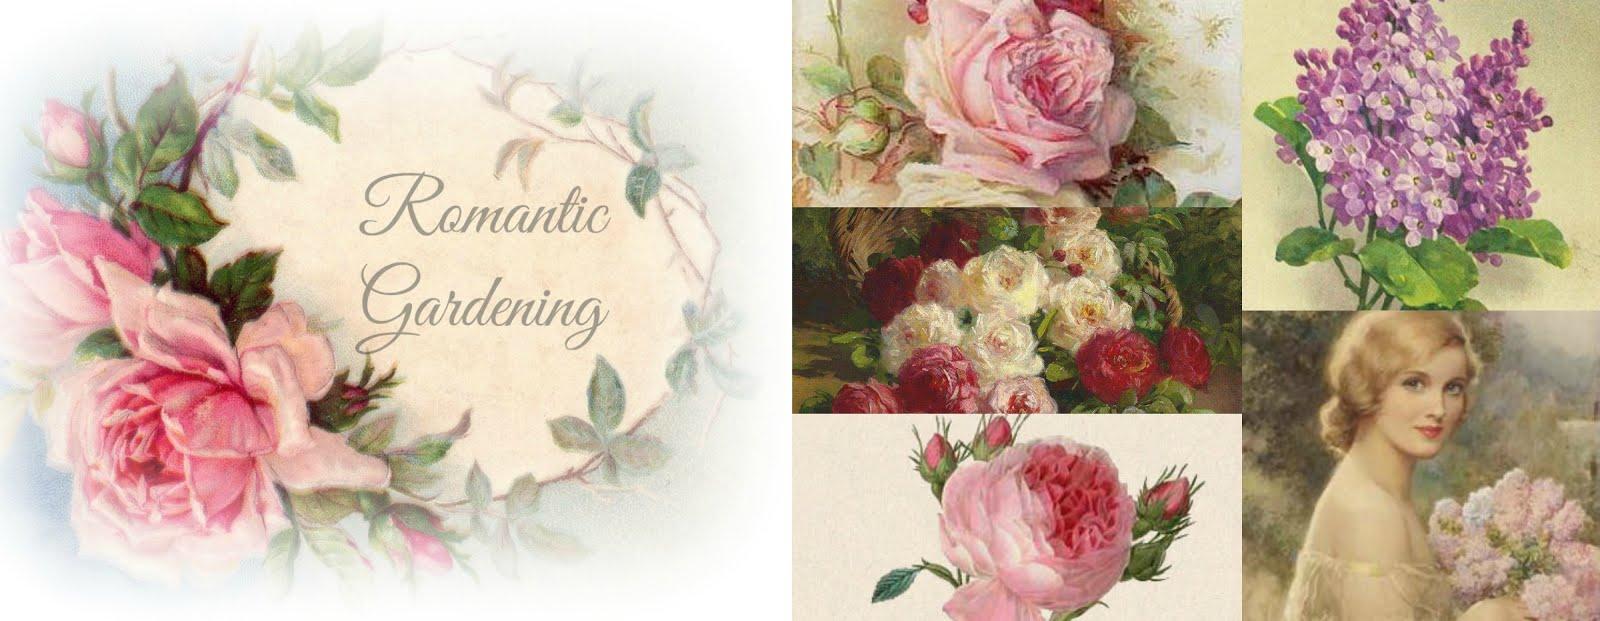 Romantic Gardening